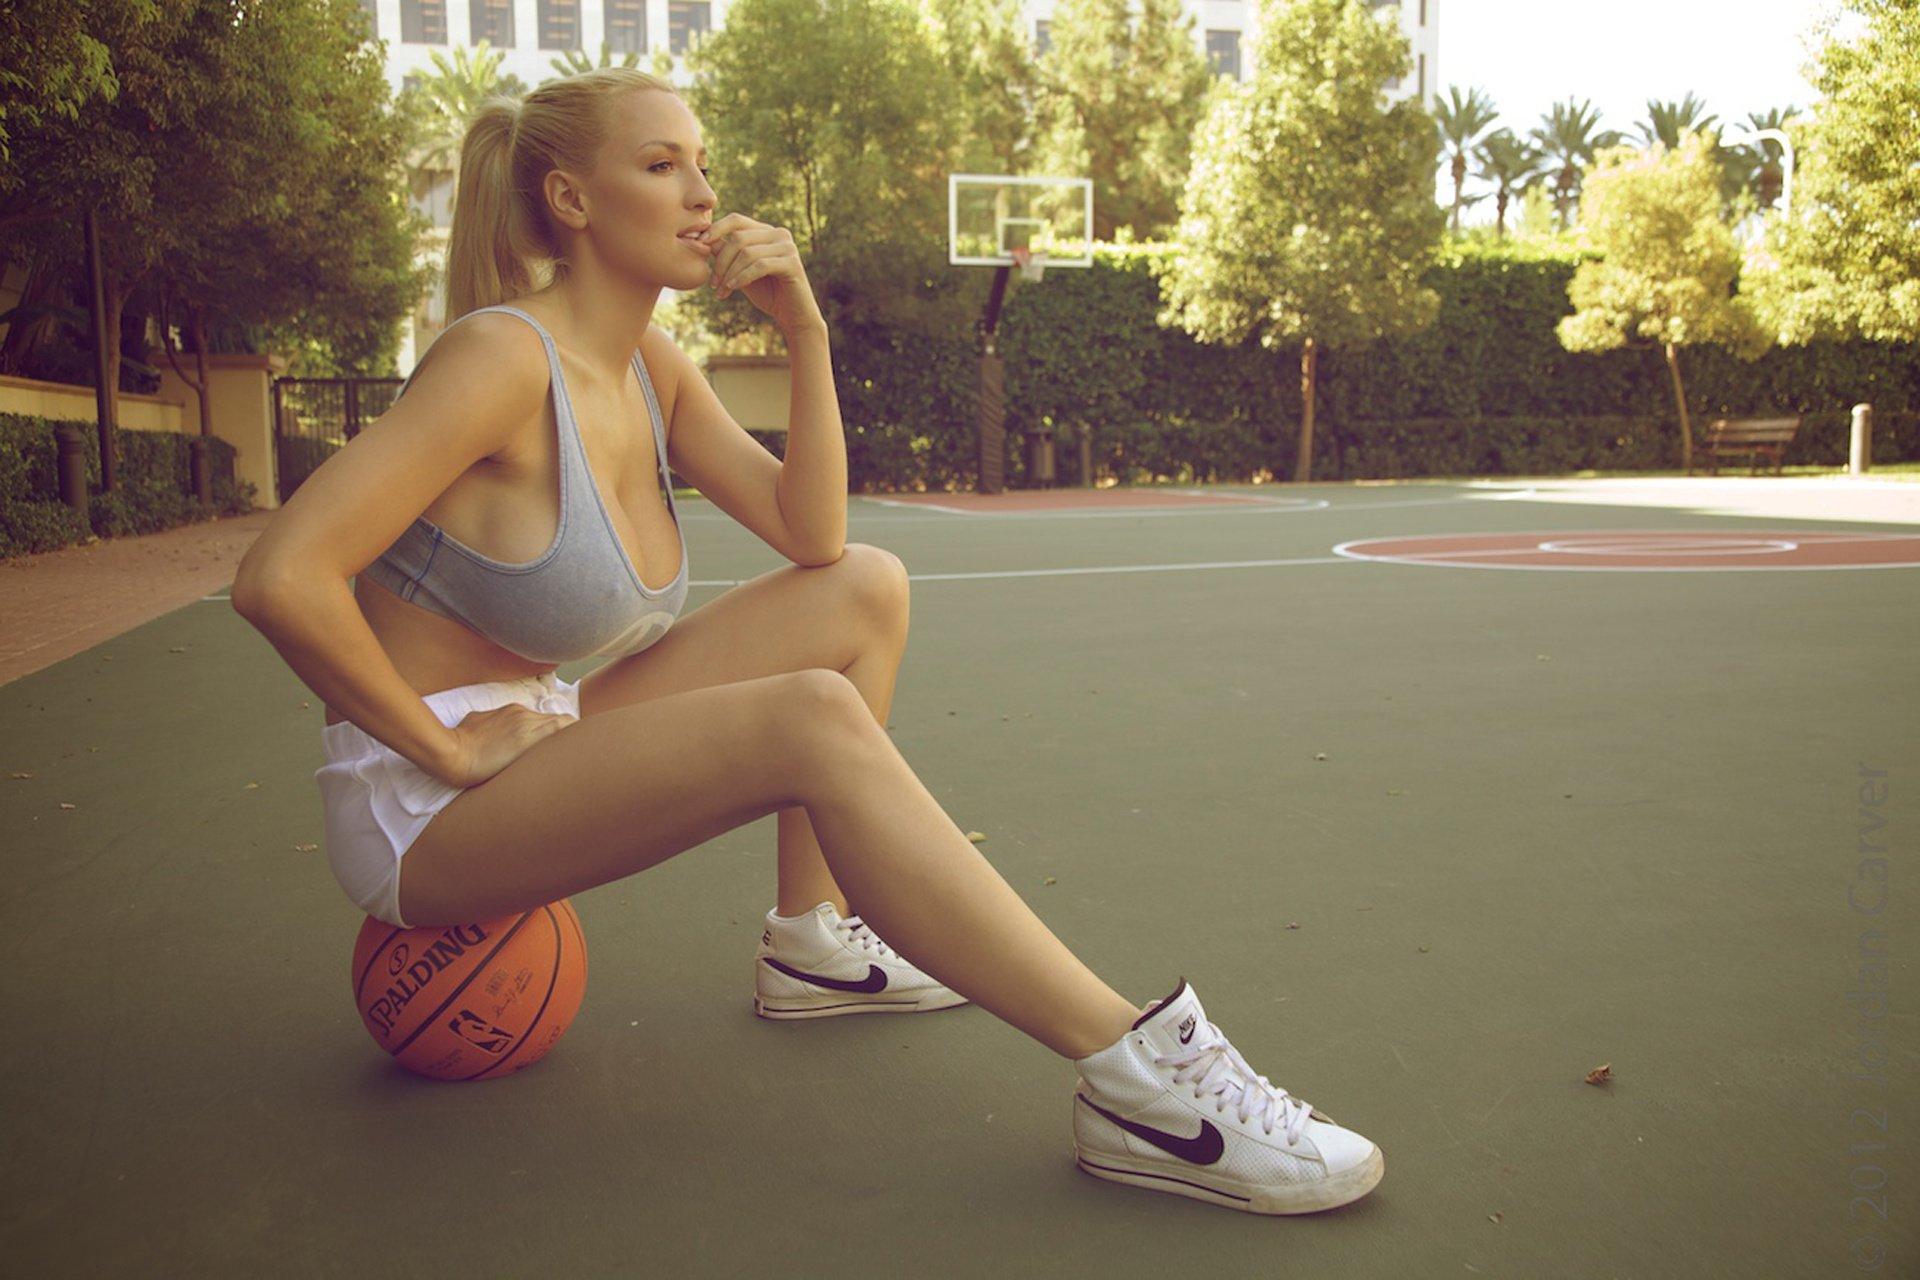 jordan carver blonde big breasts playground basketball ball shoes